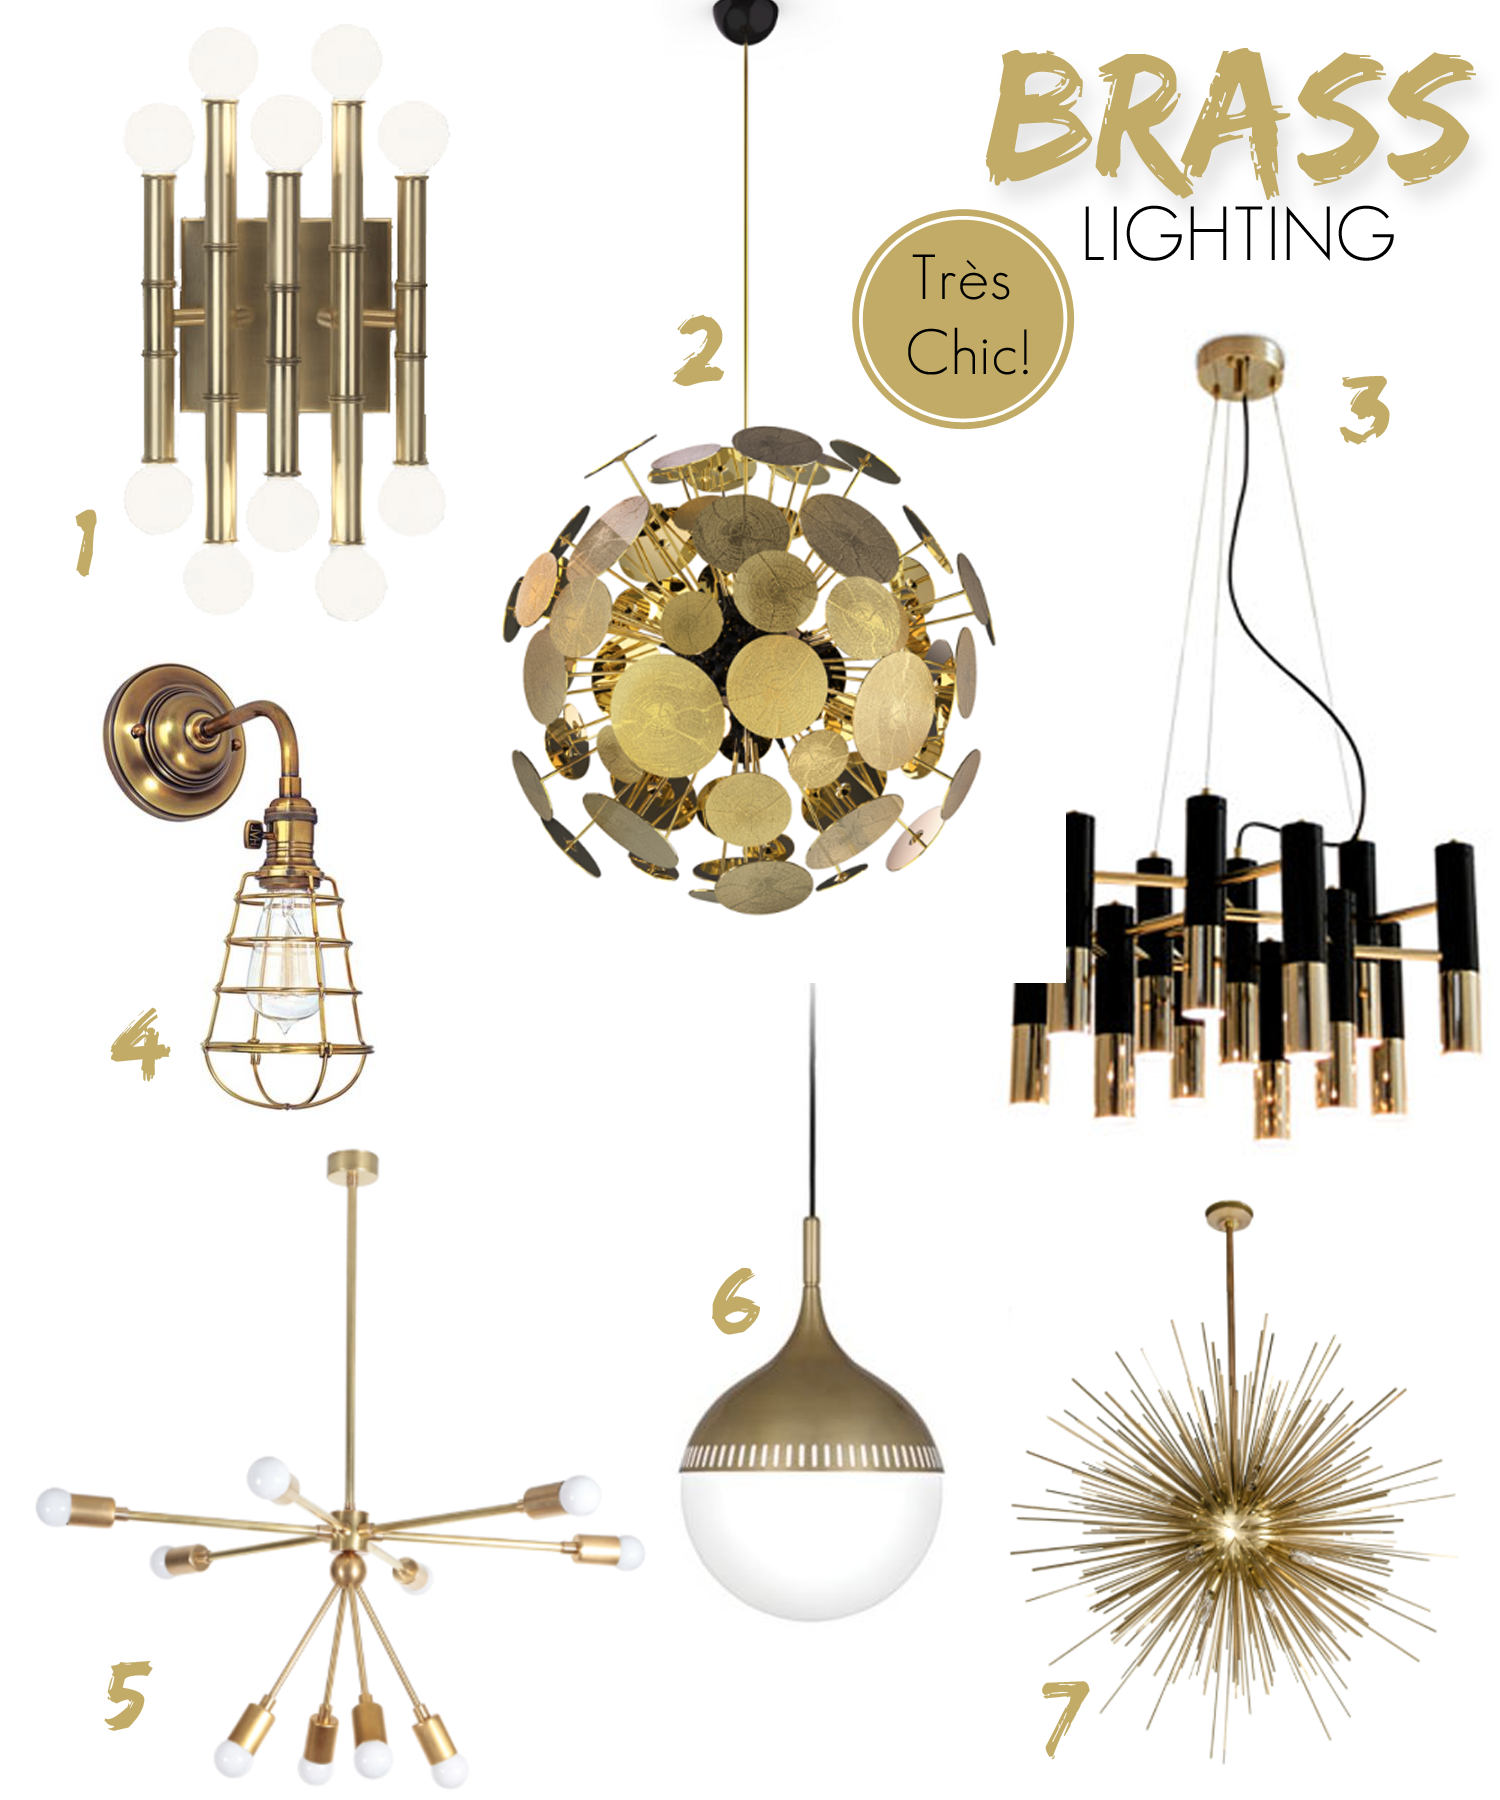 a touch of brass bewhatwelove brass lighting fixtures